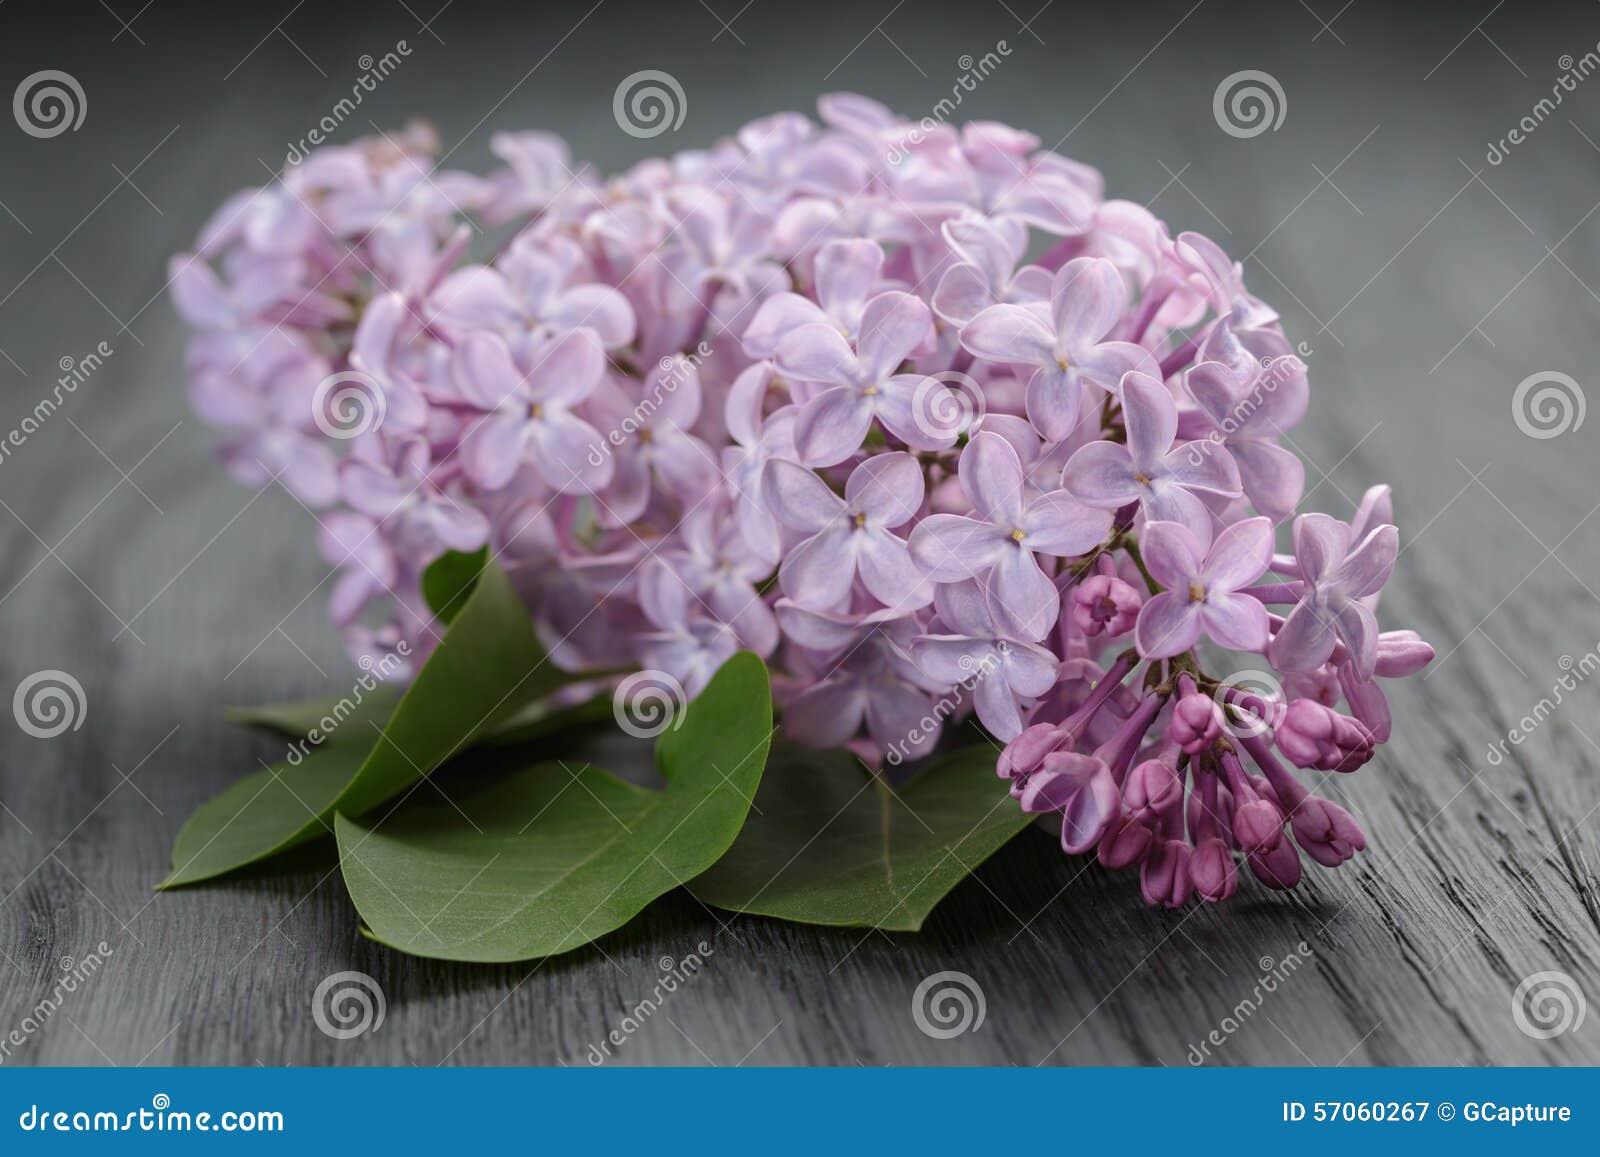 Purpere lilac bloem op oude eiken lijst